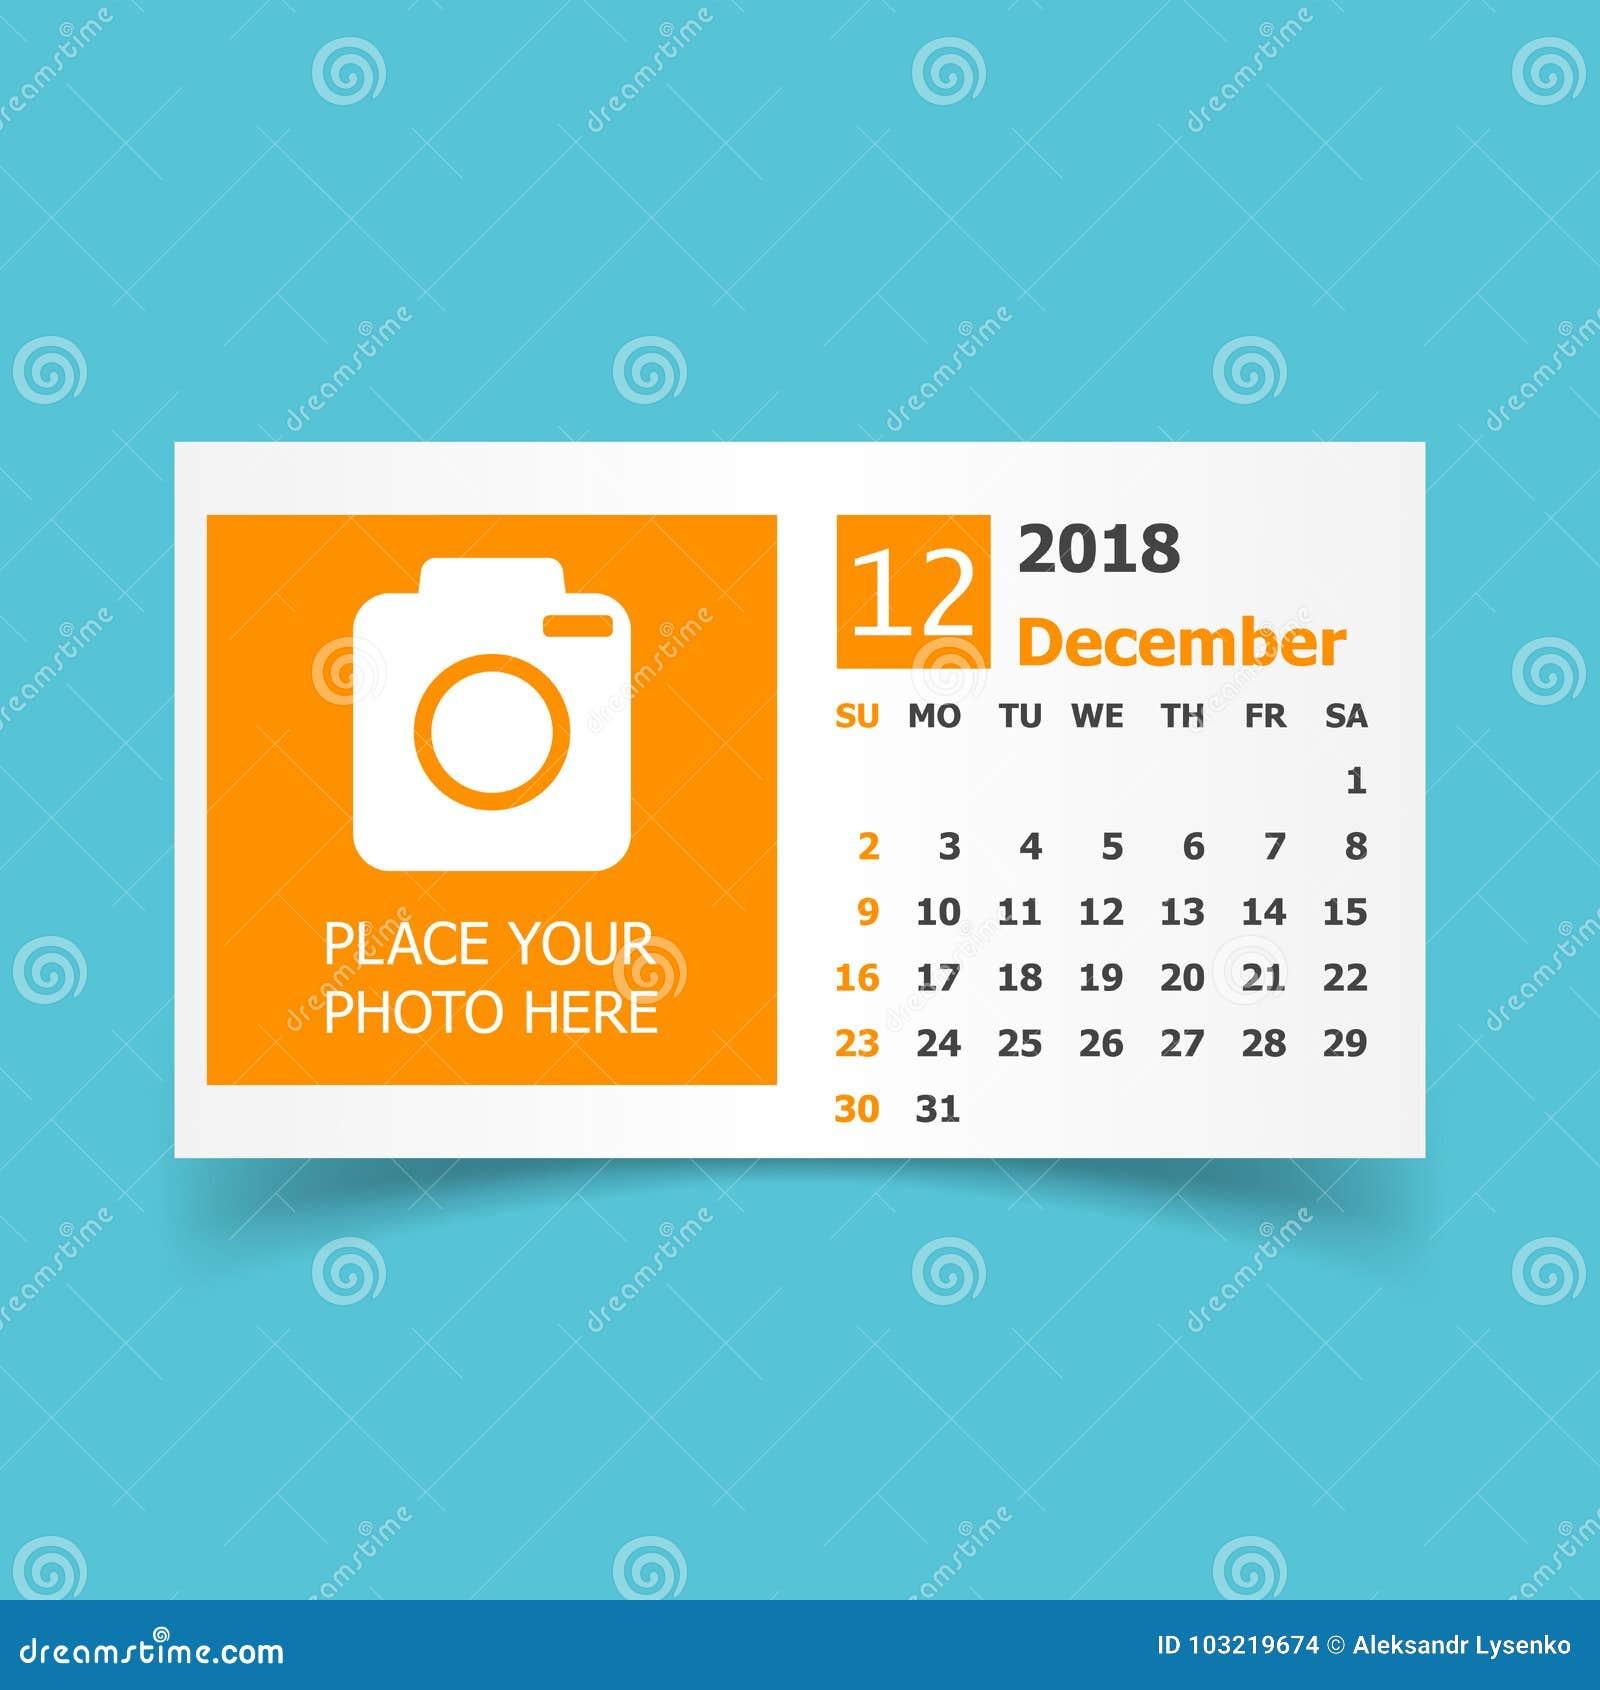 december 2018 calendar calendar planner design template with pl